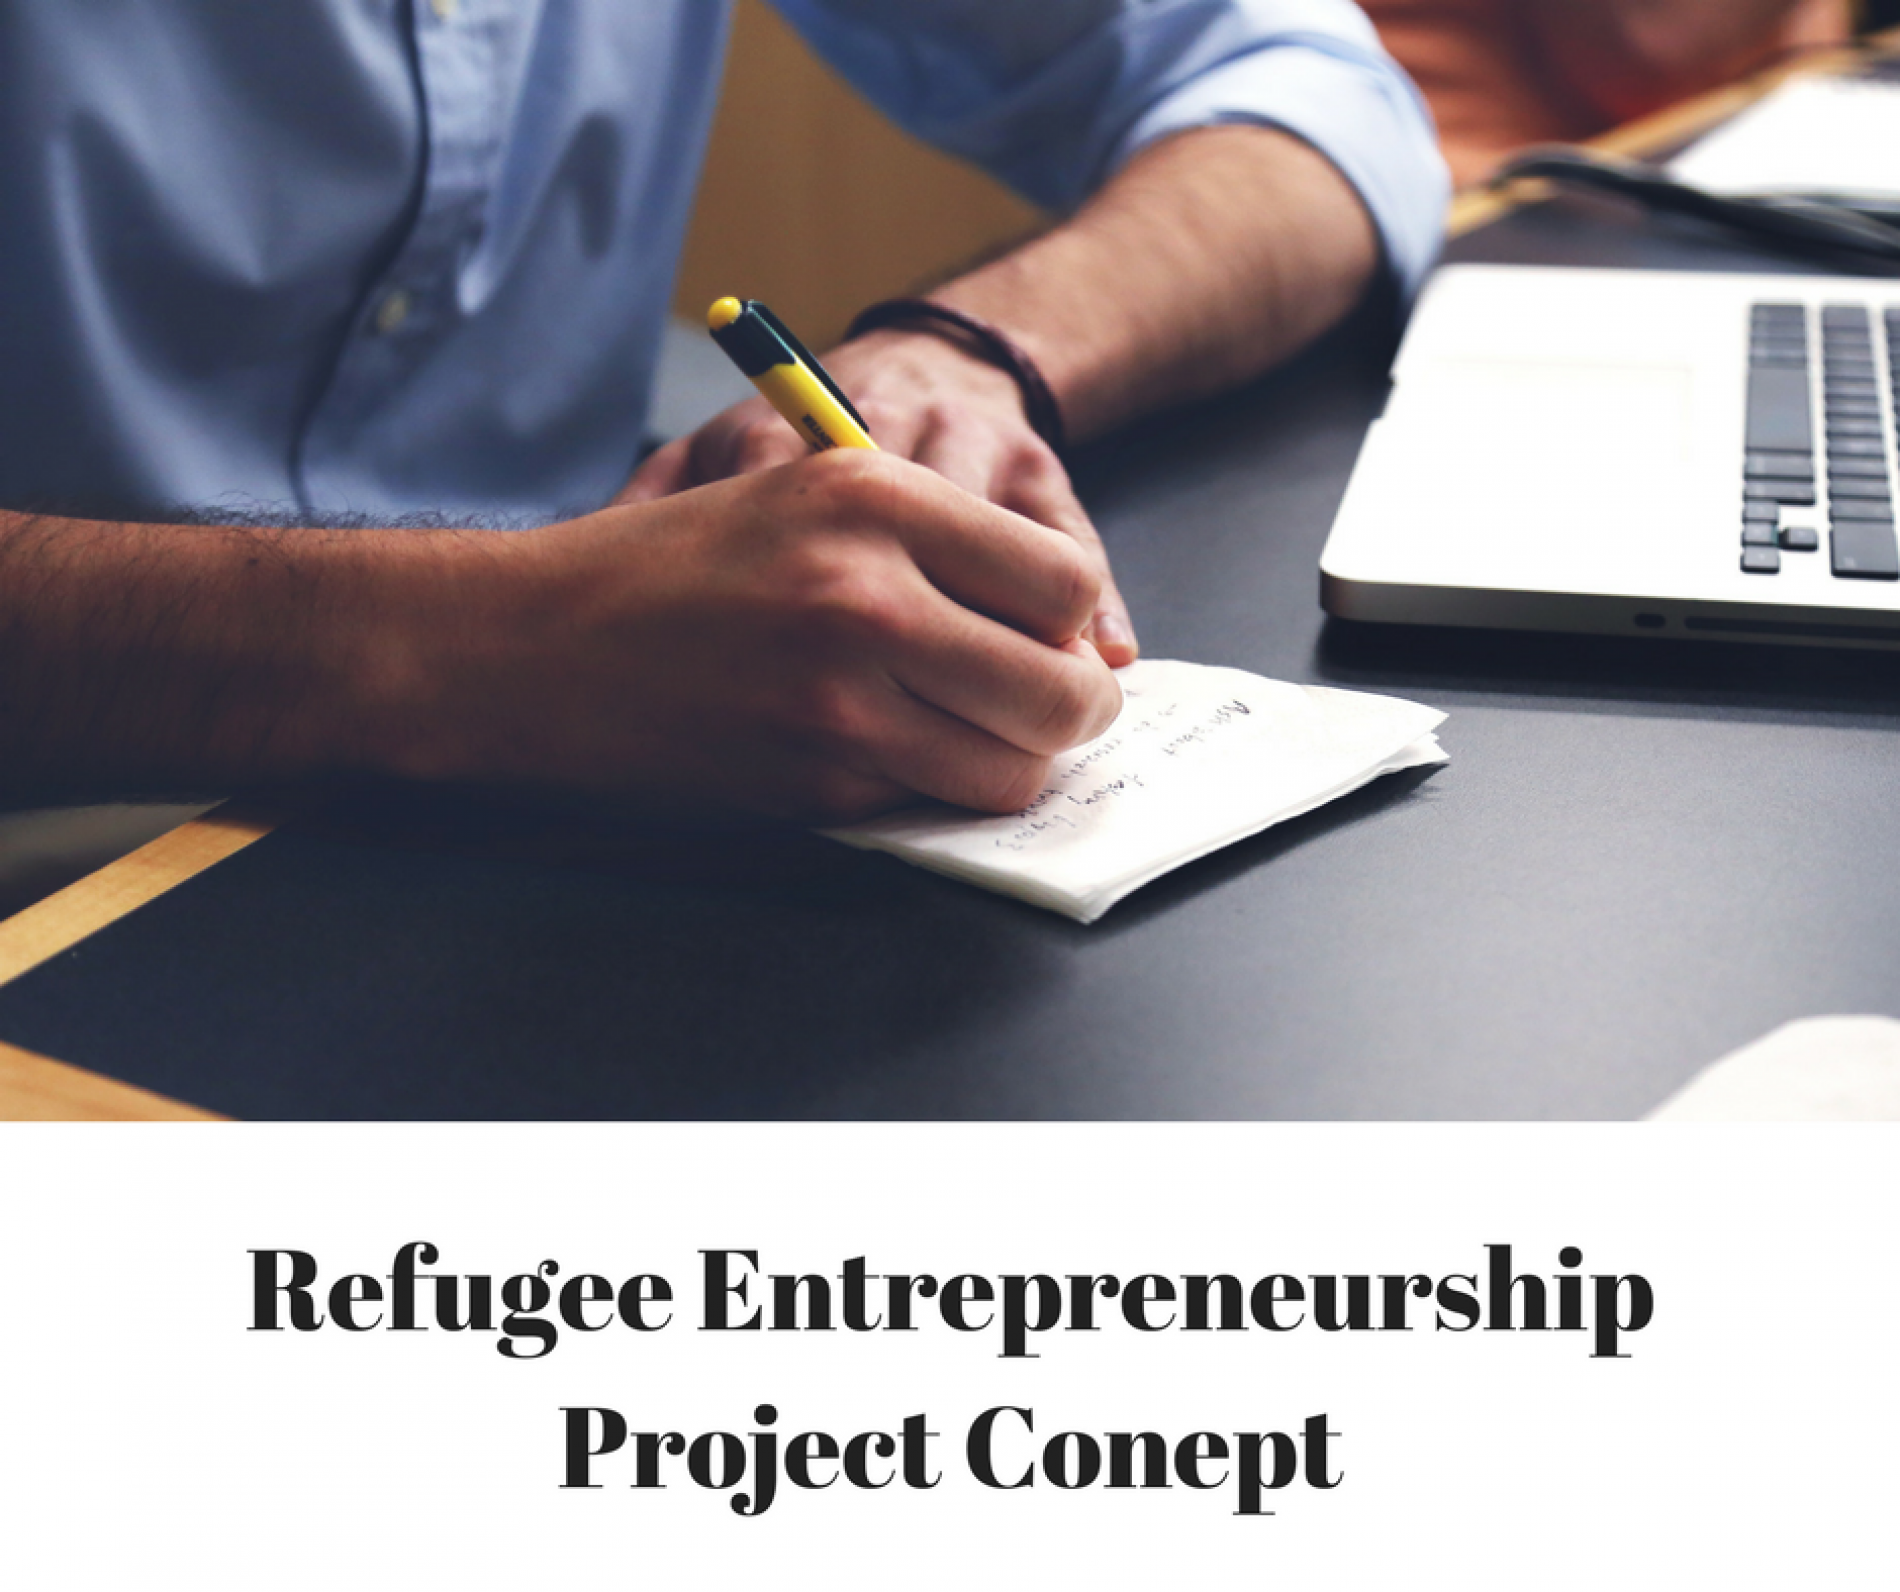 Refugee Entrepreneurship Project Concept